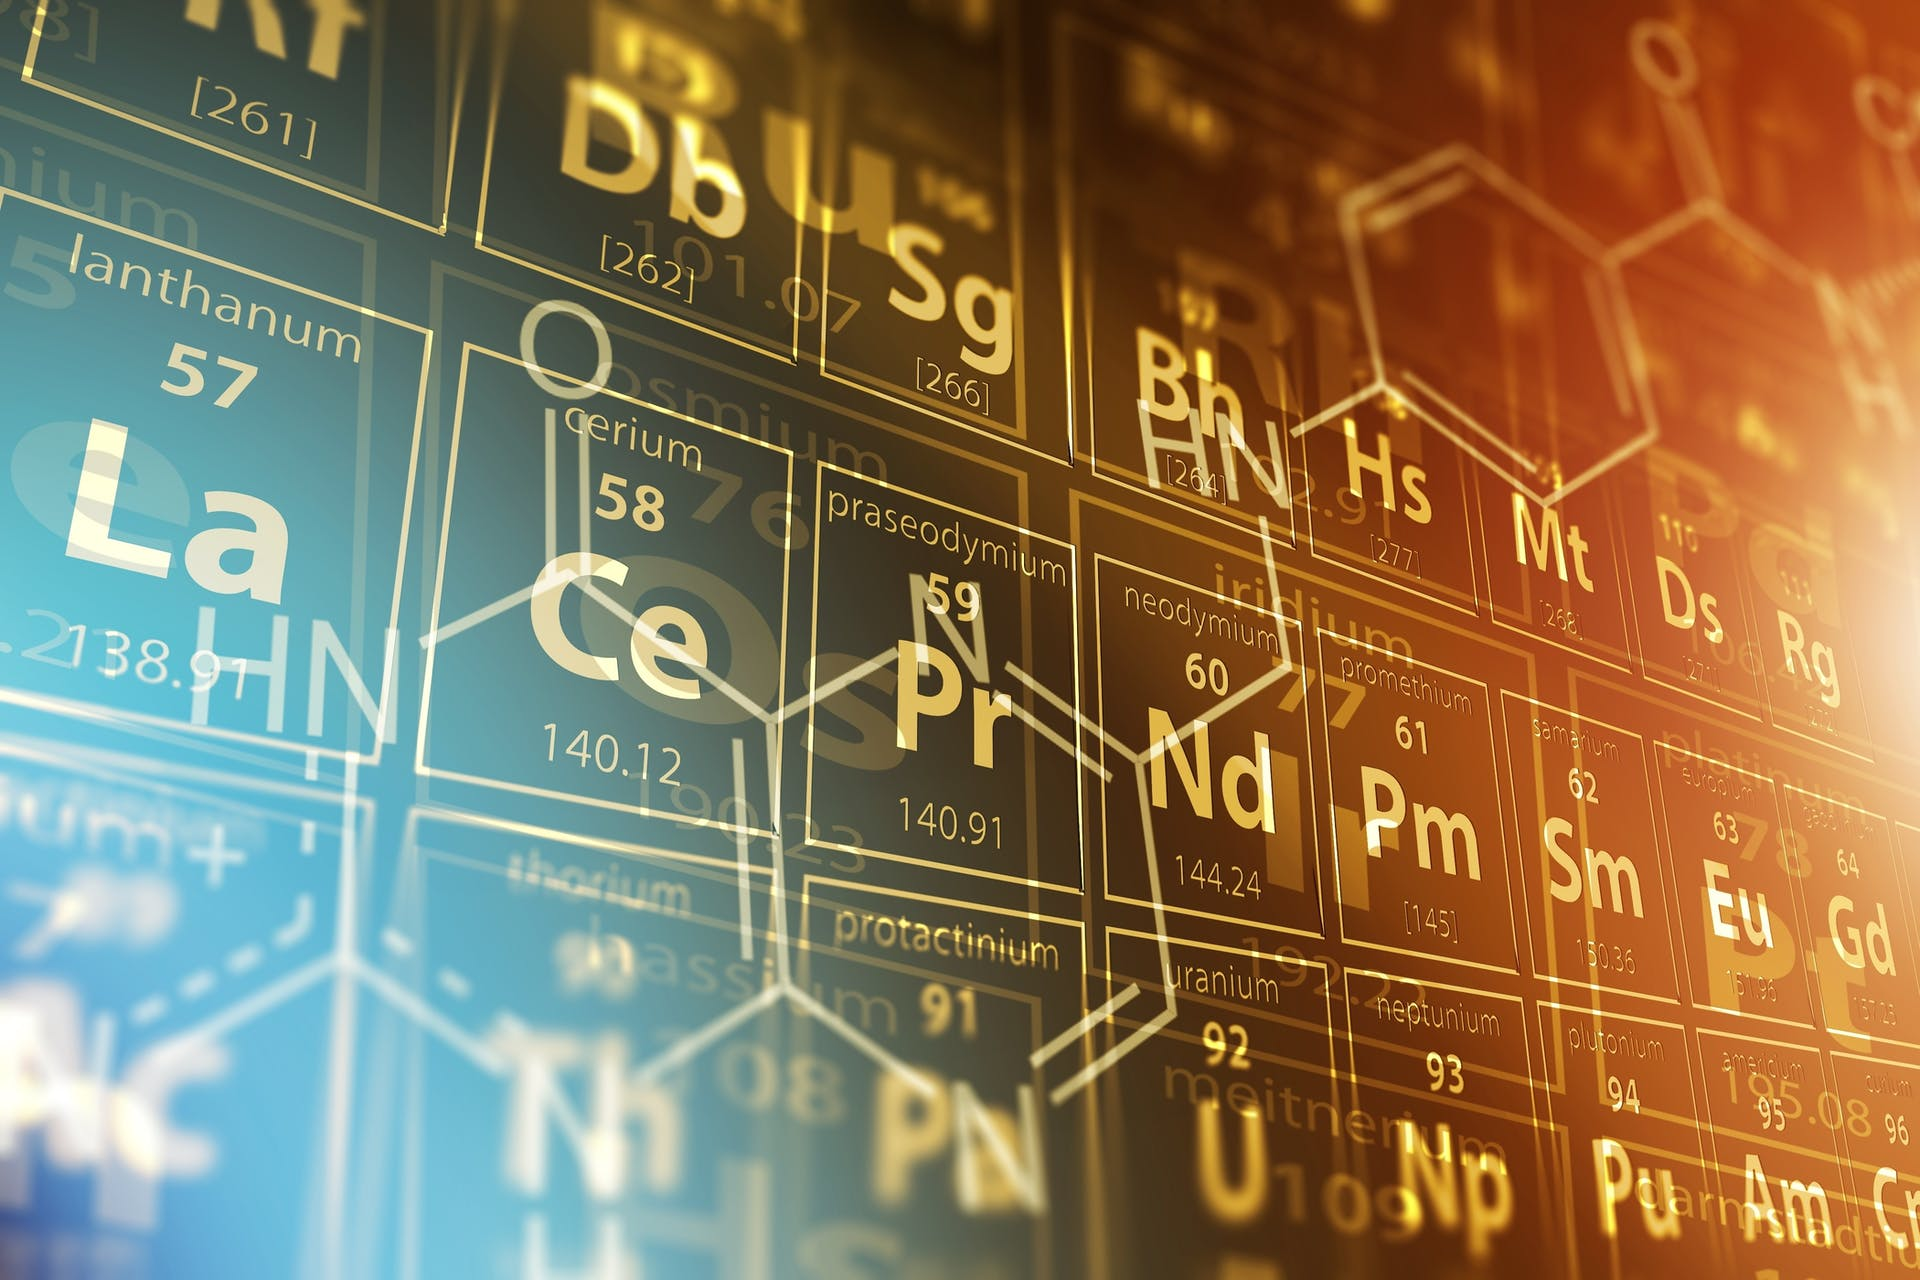 Det periodiske system - grundstoffernes periodiske system